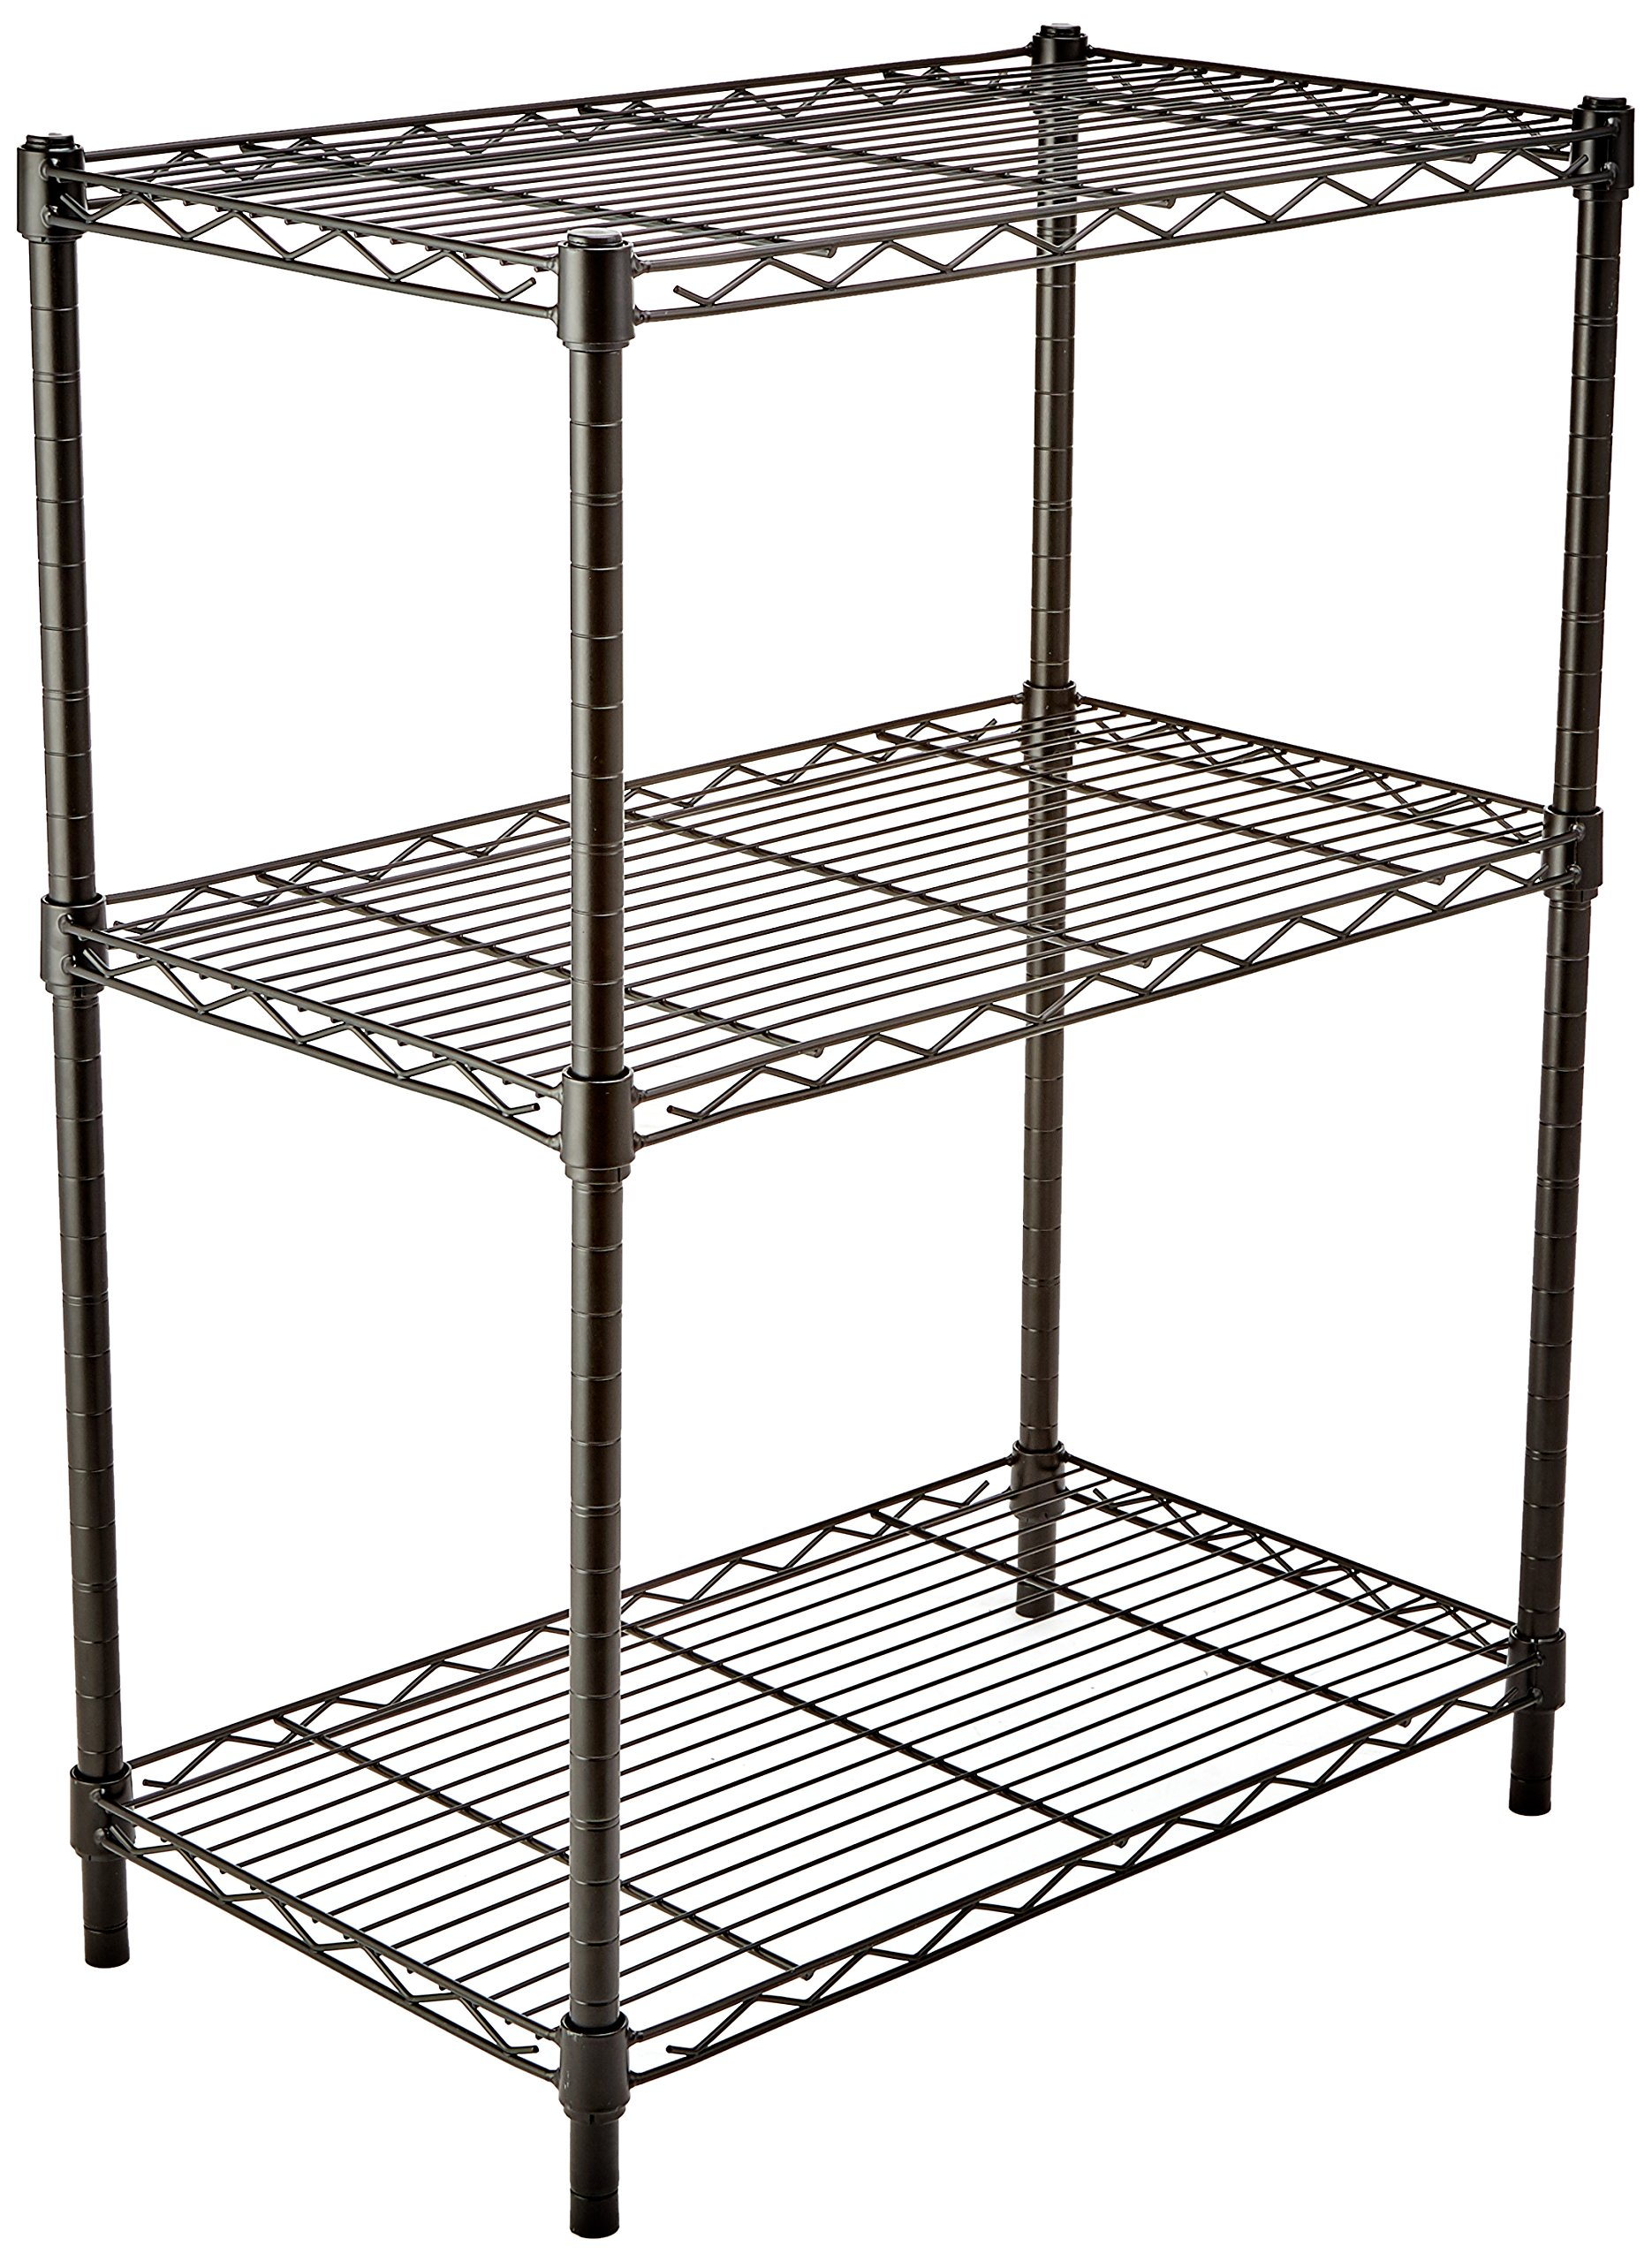 AmazonBasics 3-Shelf Shelving Unit - Black